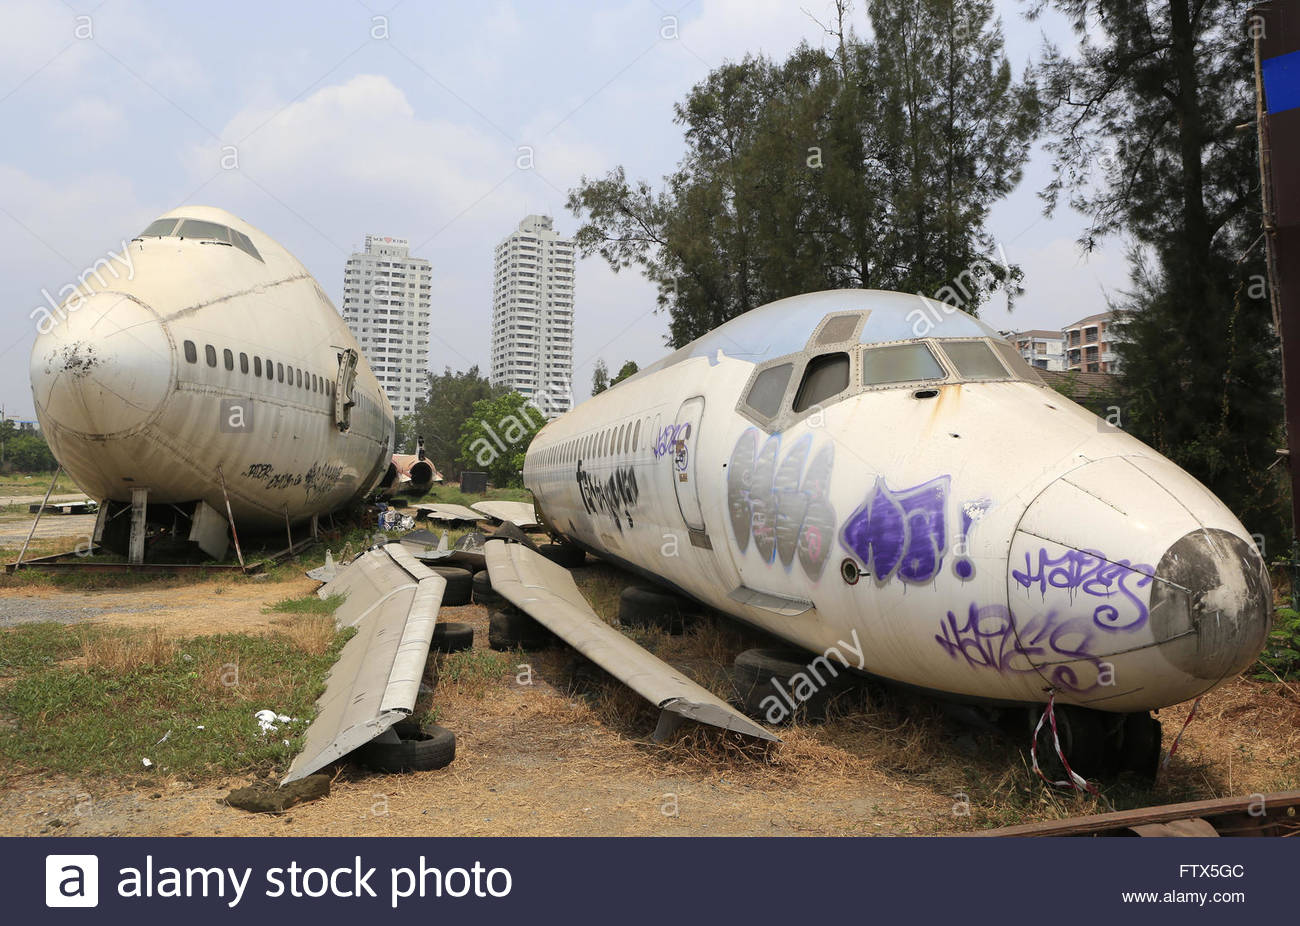 Aircraft Industries Presents A New Plane L 410 Ng At The Airport ...